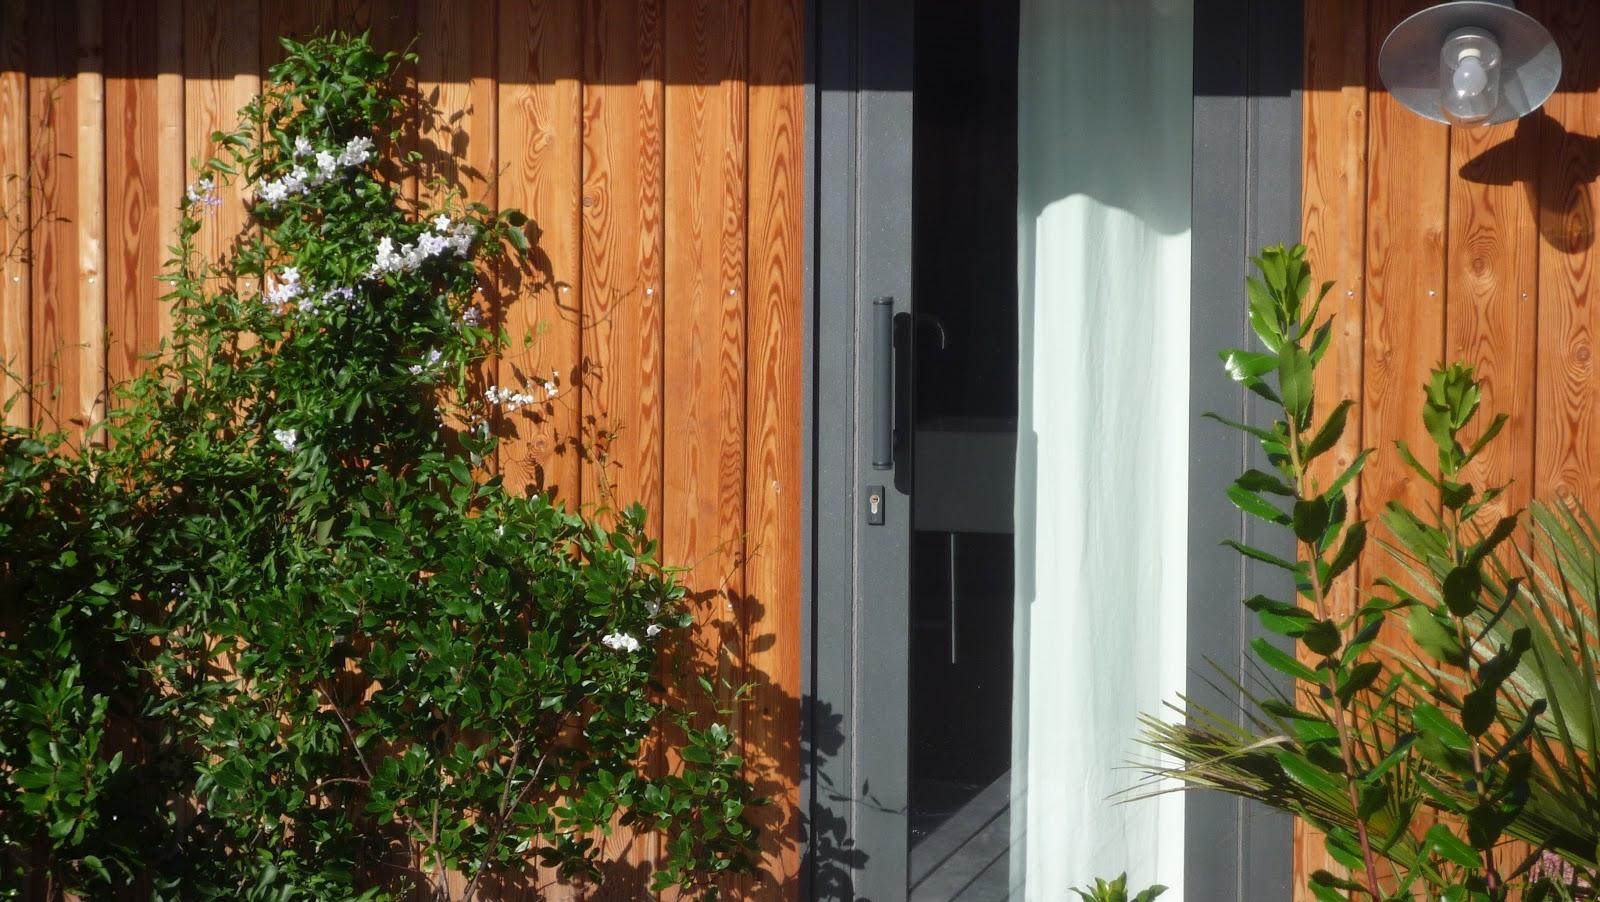 atelier dco david collinet ourthe architecte cap ferret f vrier 2015. Black Bedroom Furniture Sets. Home Design Ideas